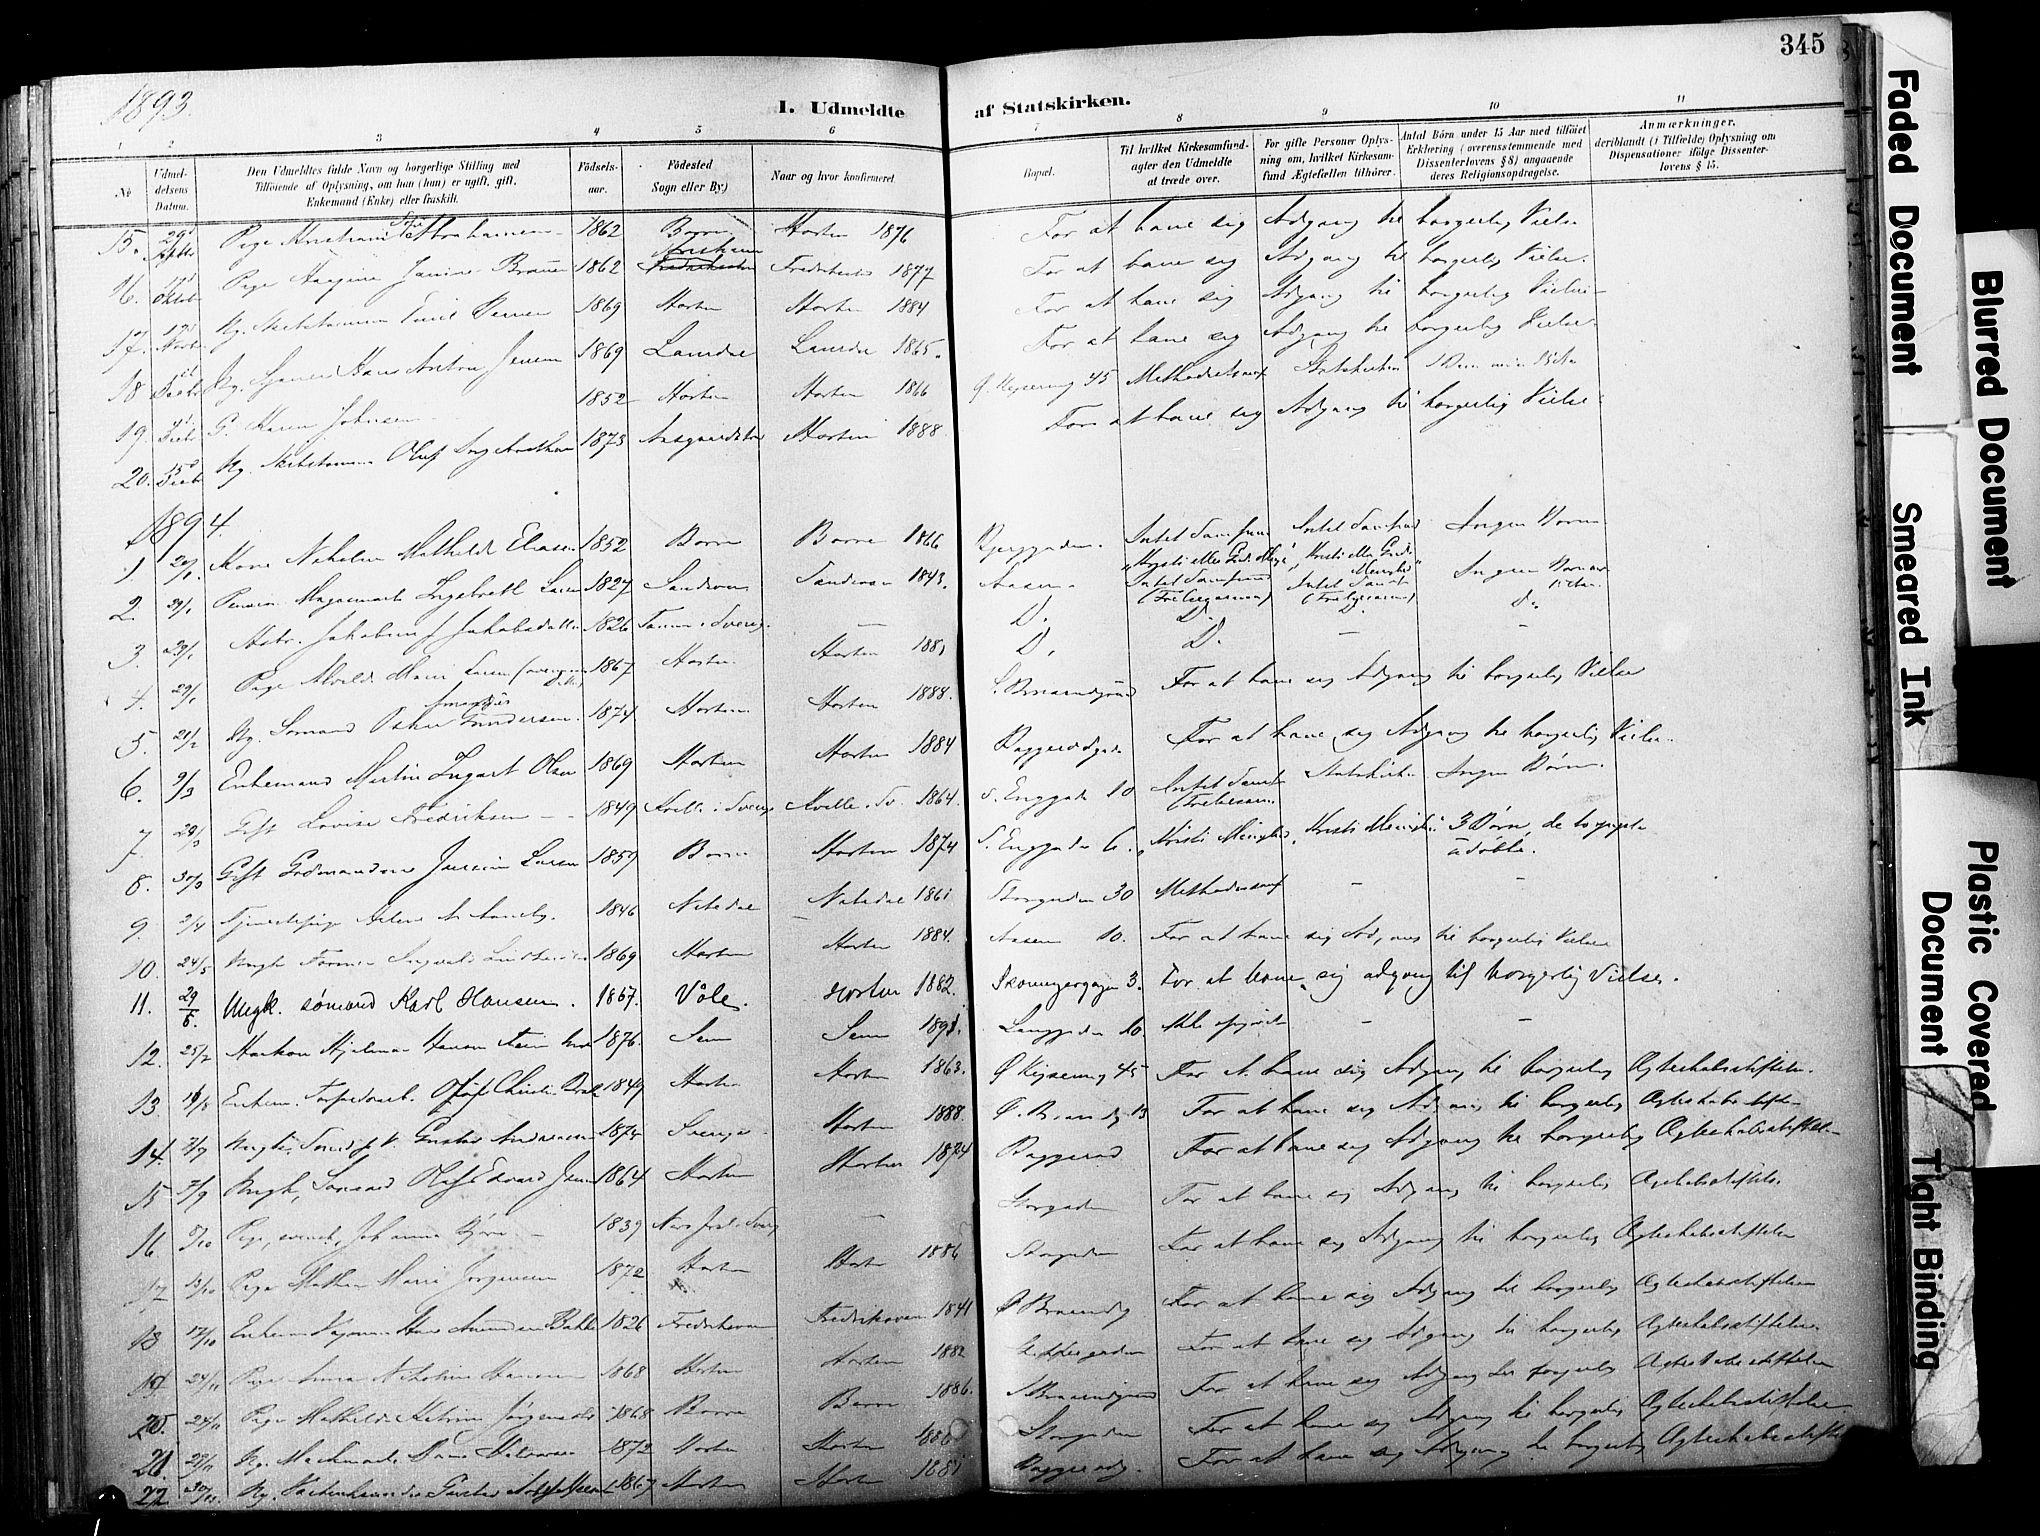 SAKO, Horten kirkebøker, F/Fa/L0004: Parish register (official) no. 4, 1888-1895, p. 345